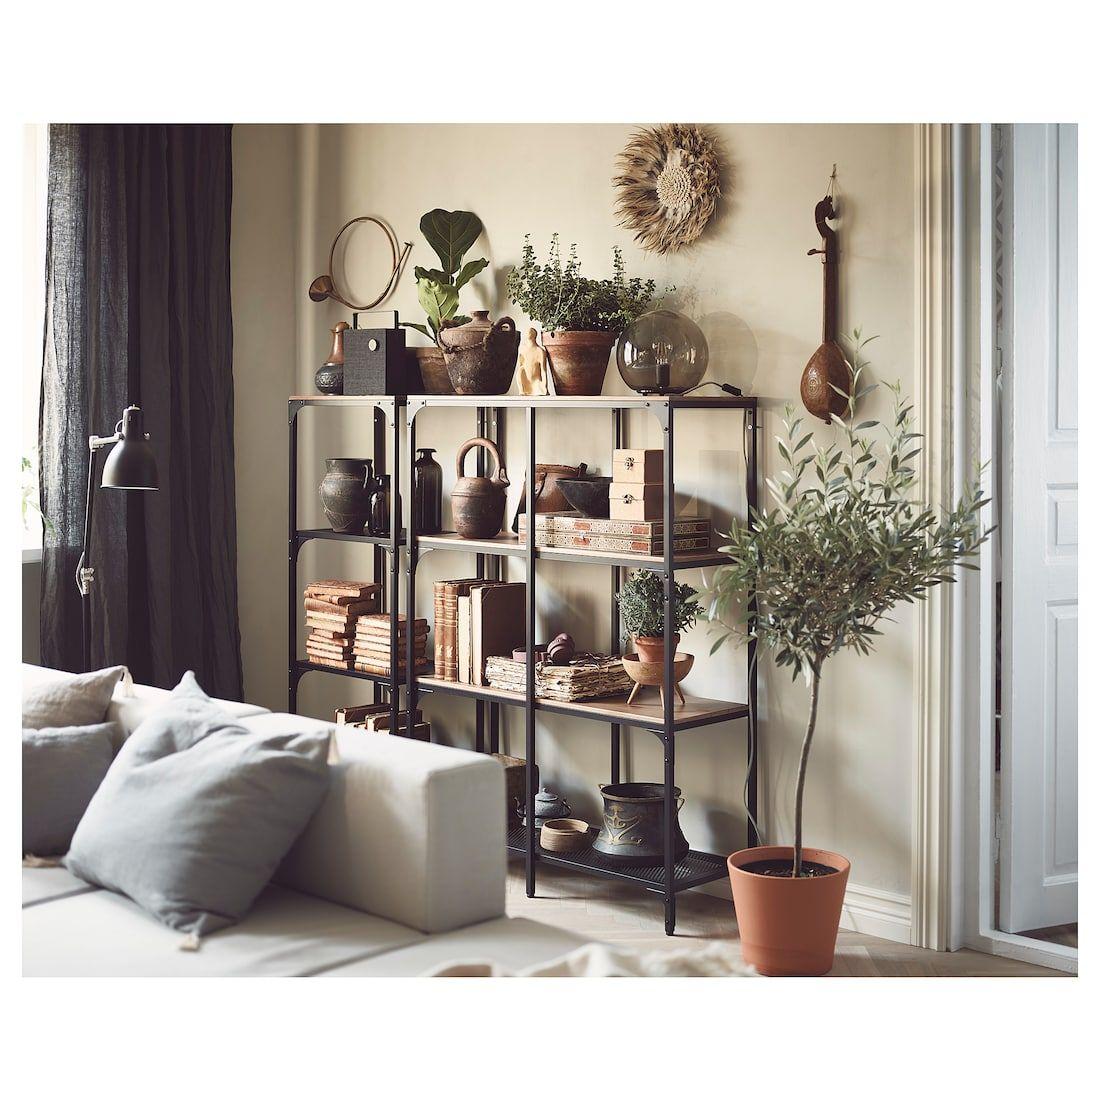 Fjallbo Shelf Unit Black 39 3 8x53 1 2 Ikea Living Room Accessories Shelving Unit Timeless Furniture #shelf #unit #living #room